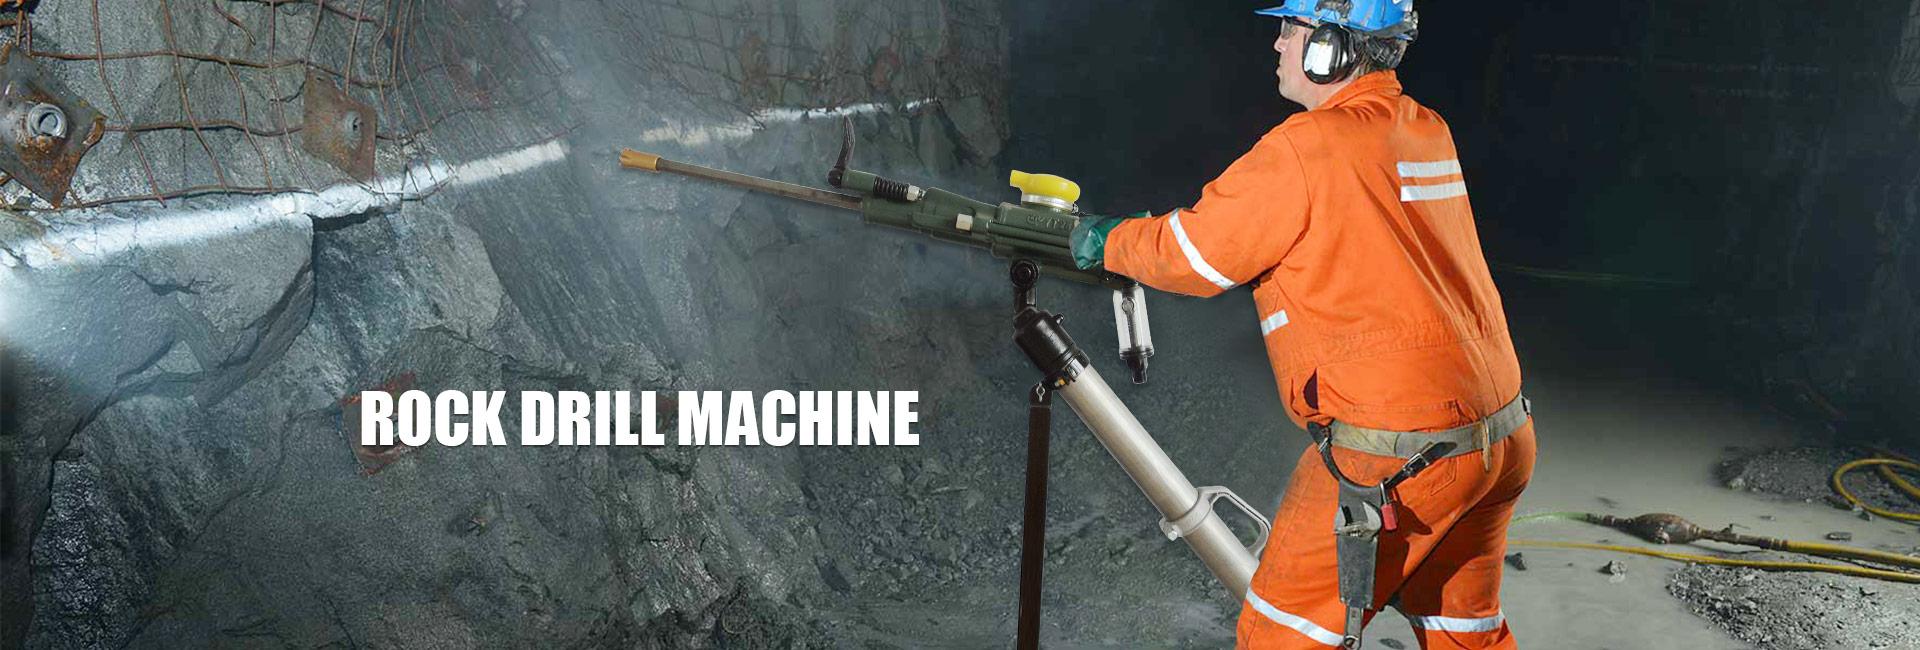 Rock Drill Machine